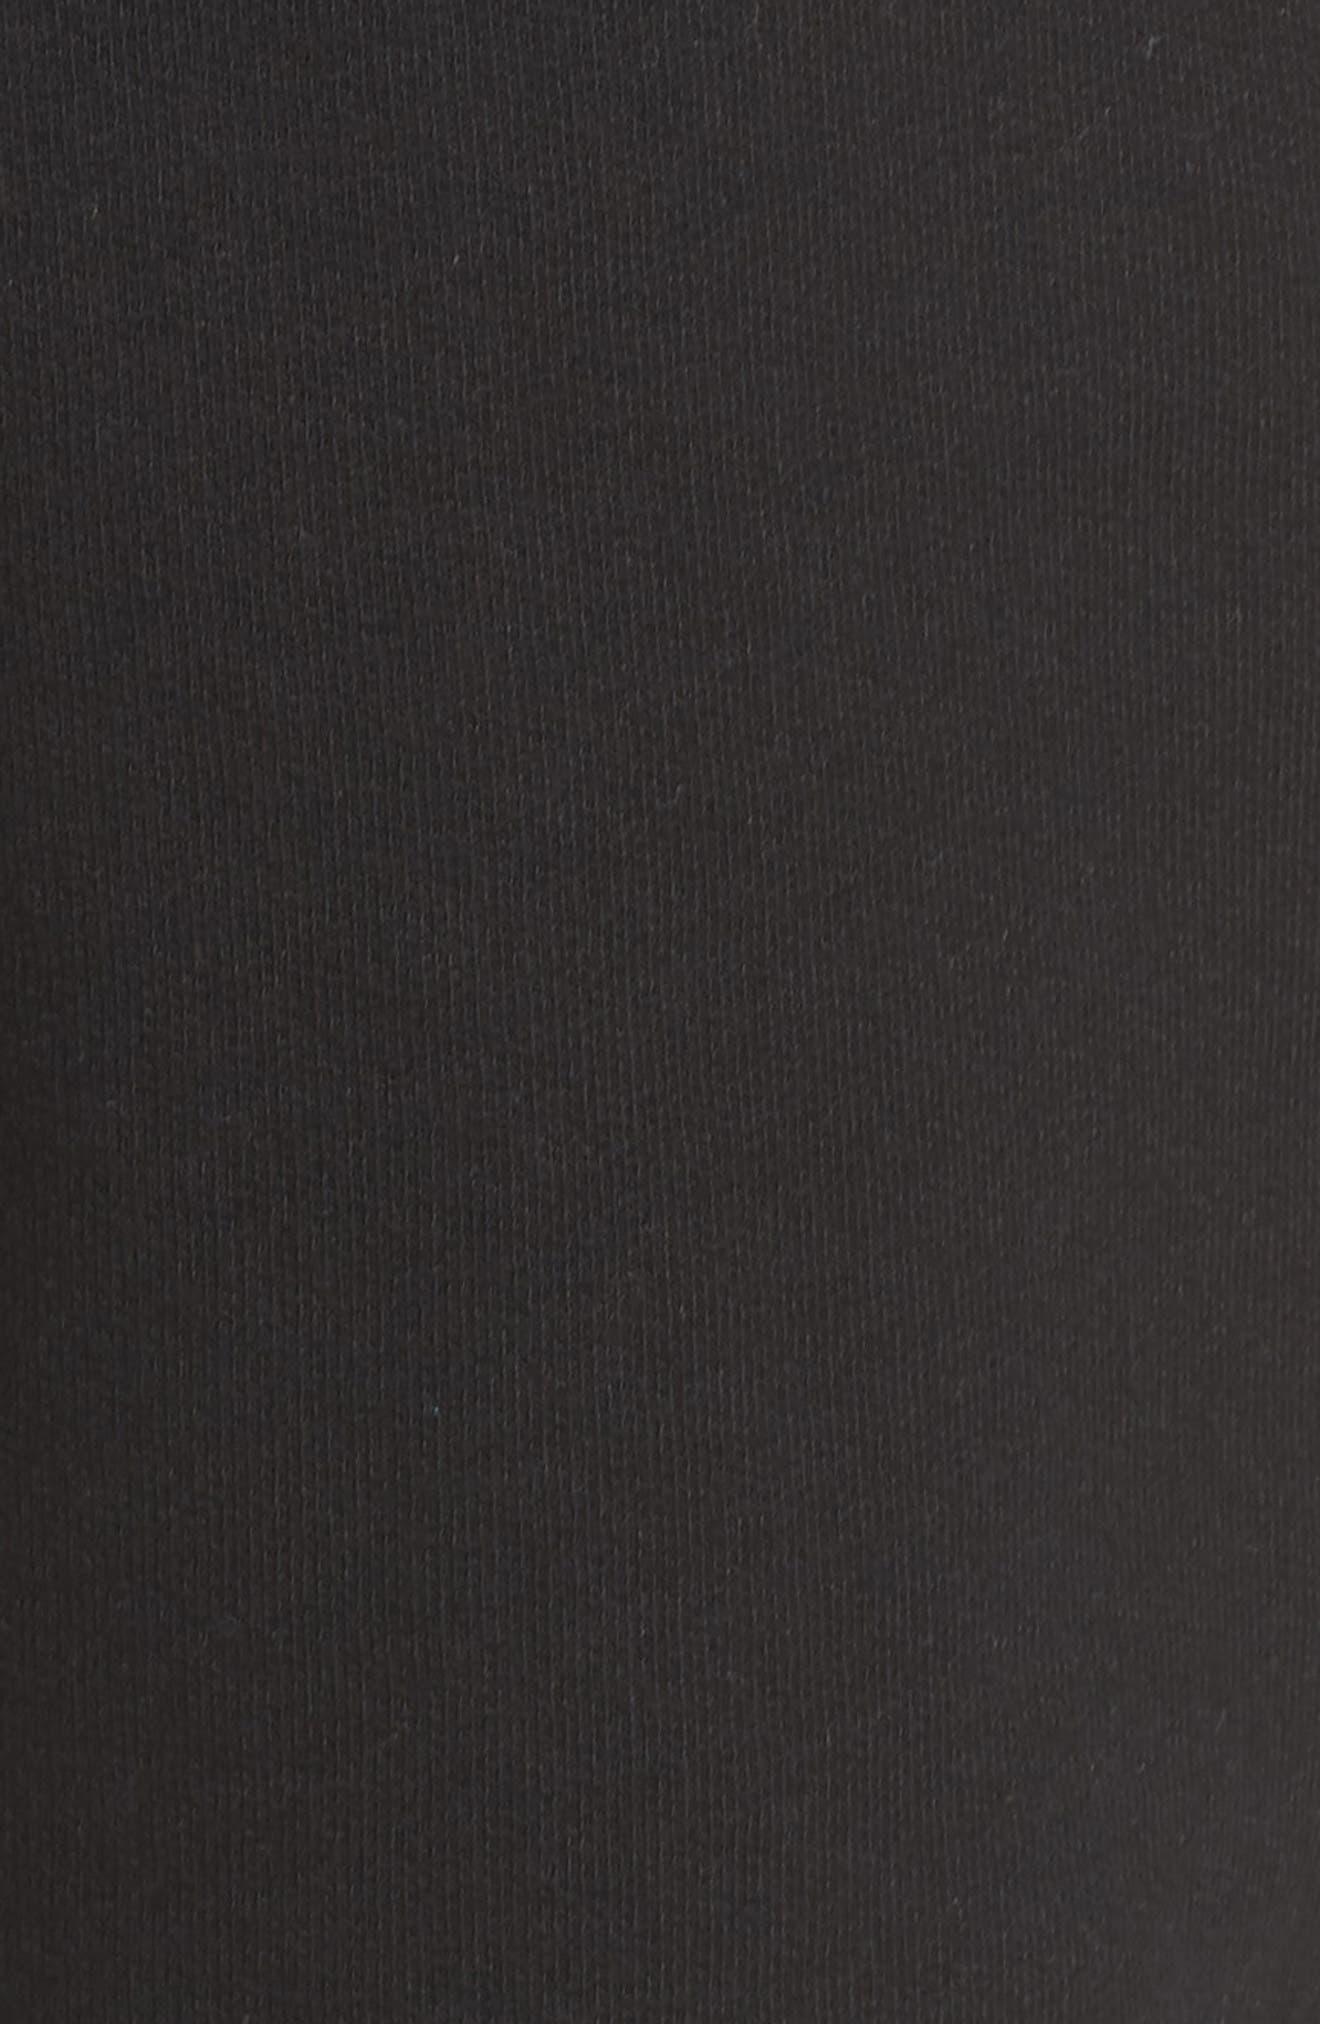 Blonde Lounge Shorts,                             Alternate thumbnail 5, color,                             008